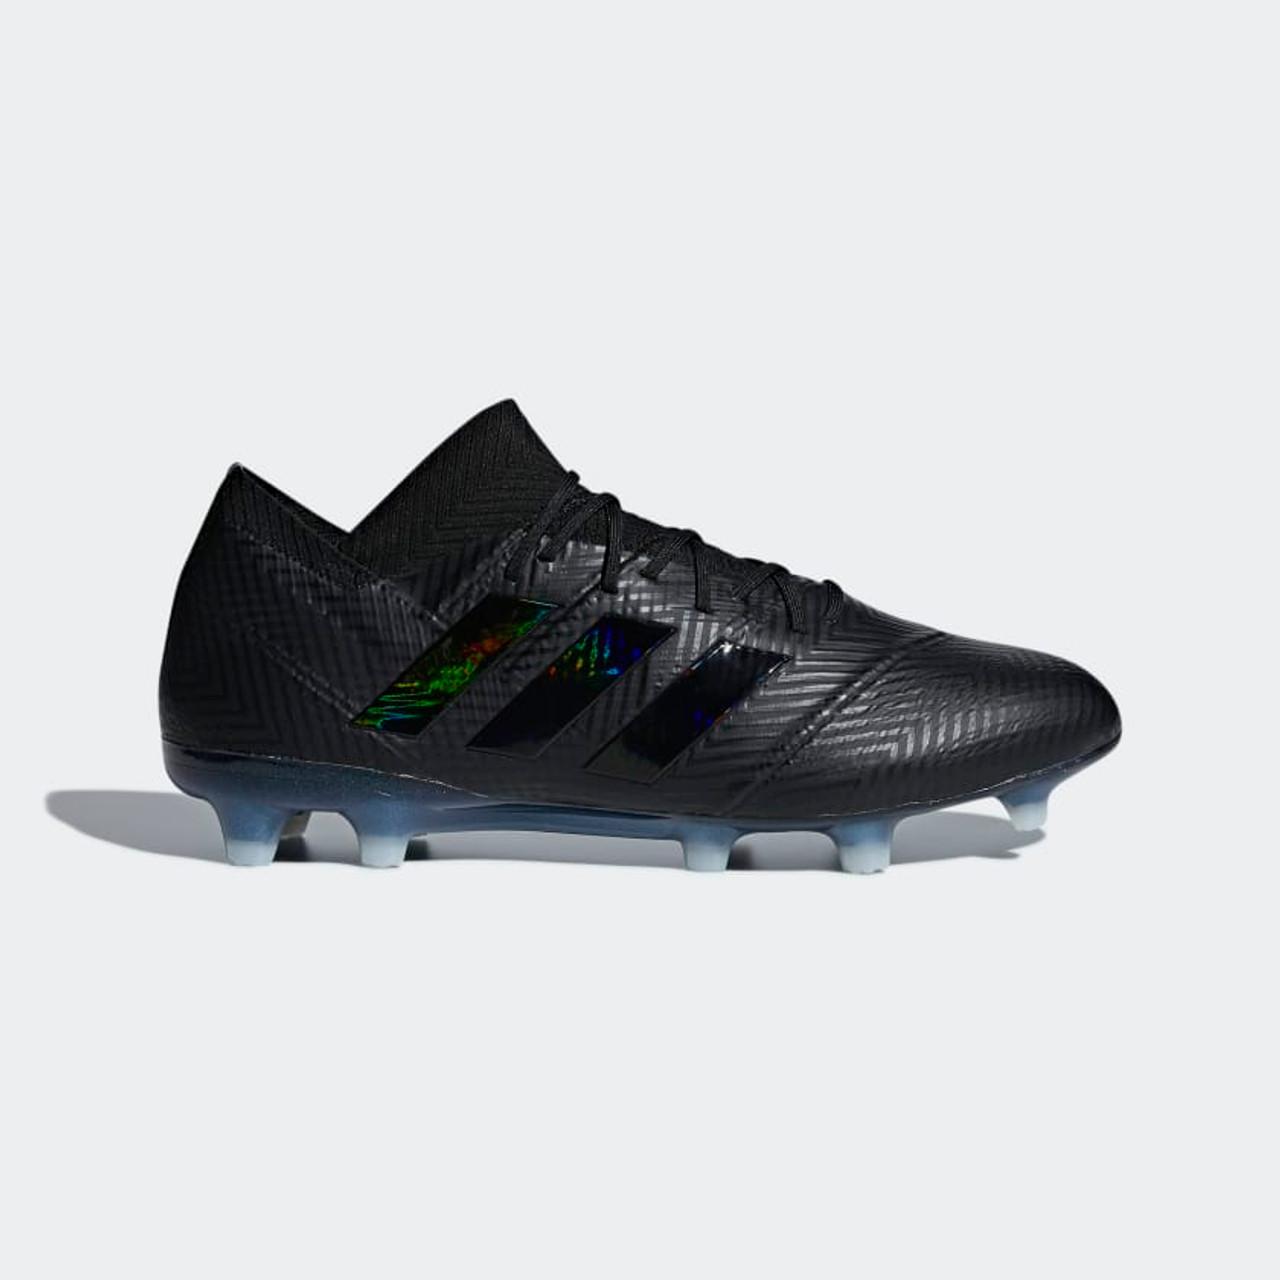 ef3bdd30f5f ADIDAS NEMEZIZ 18.1 FG CORE BLACK - Soccer Plus